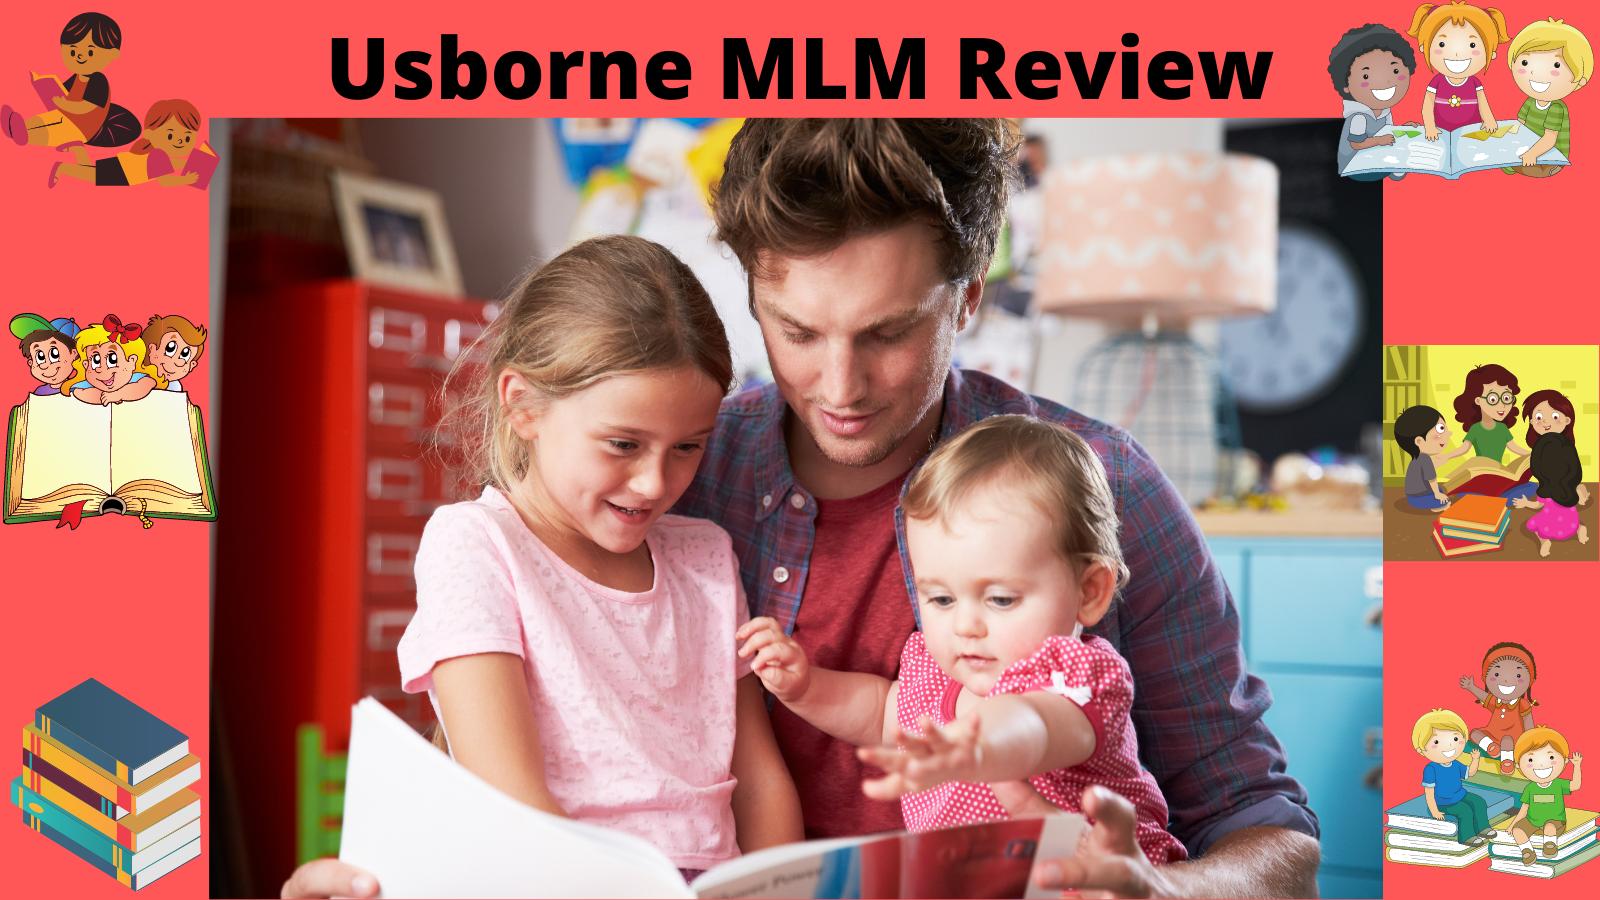 Usborne MLM Review